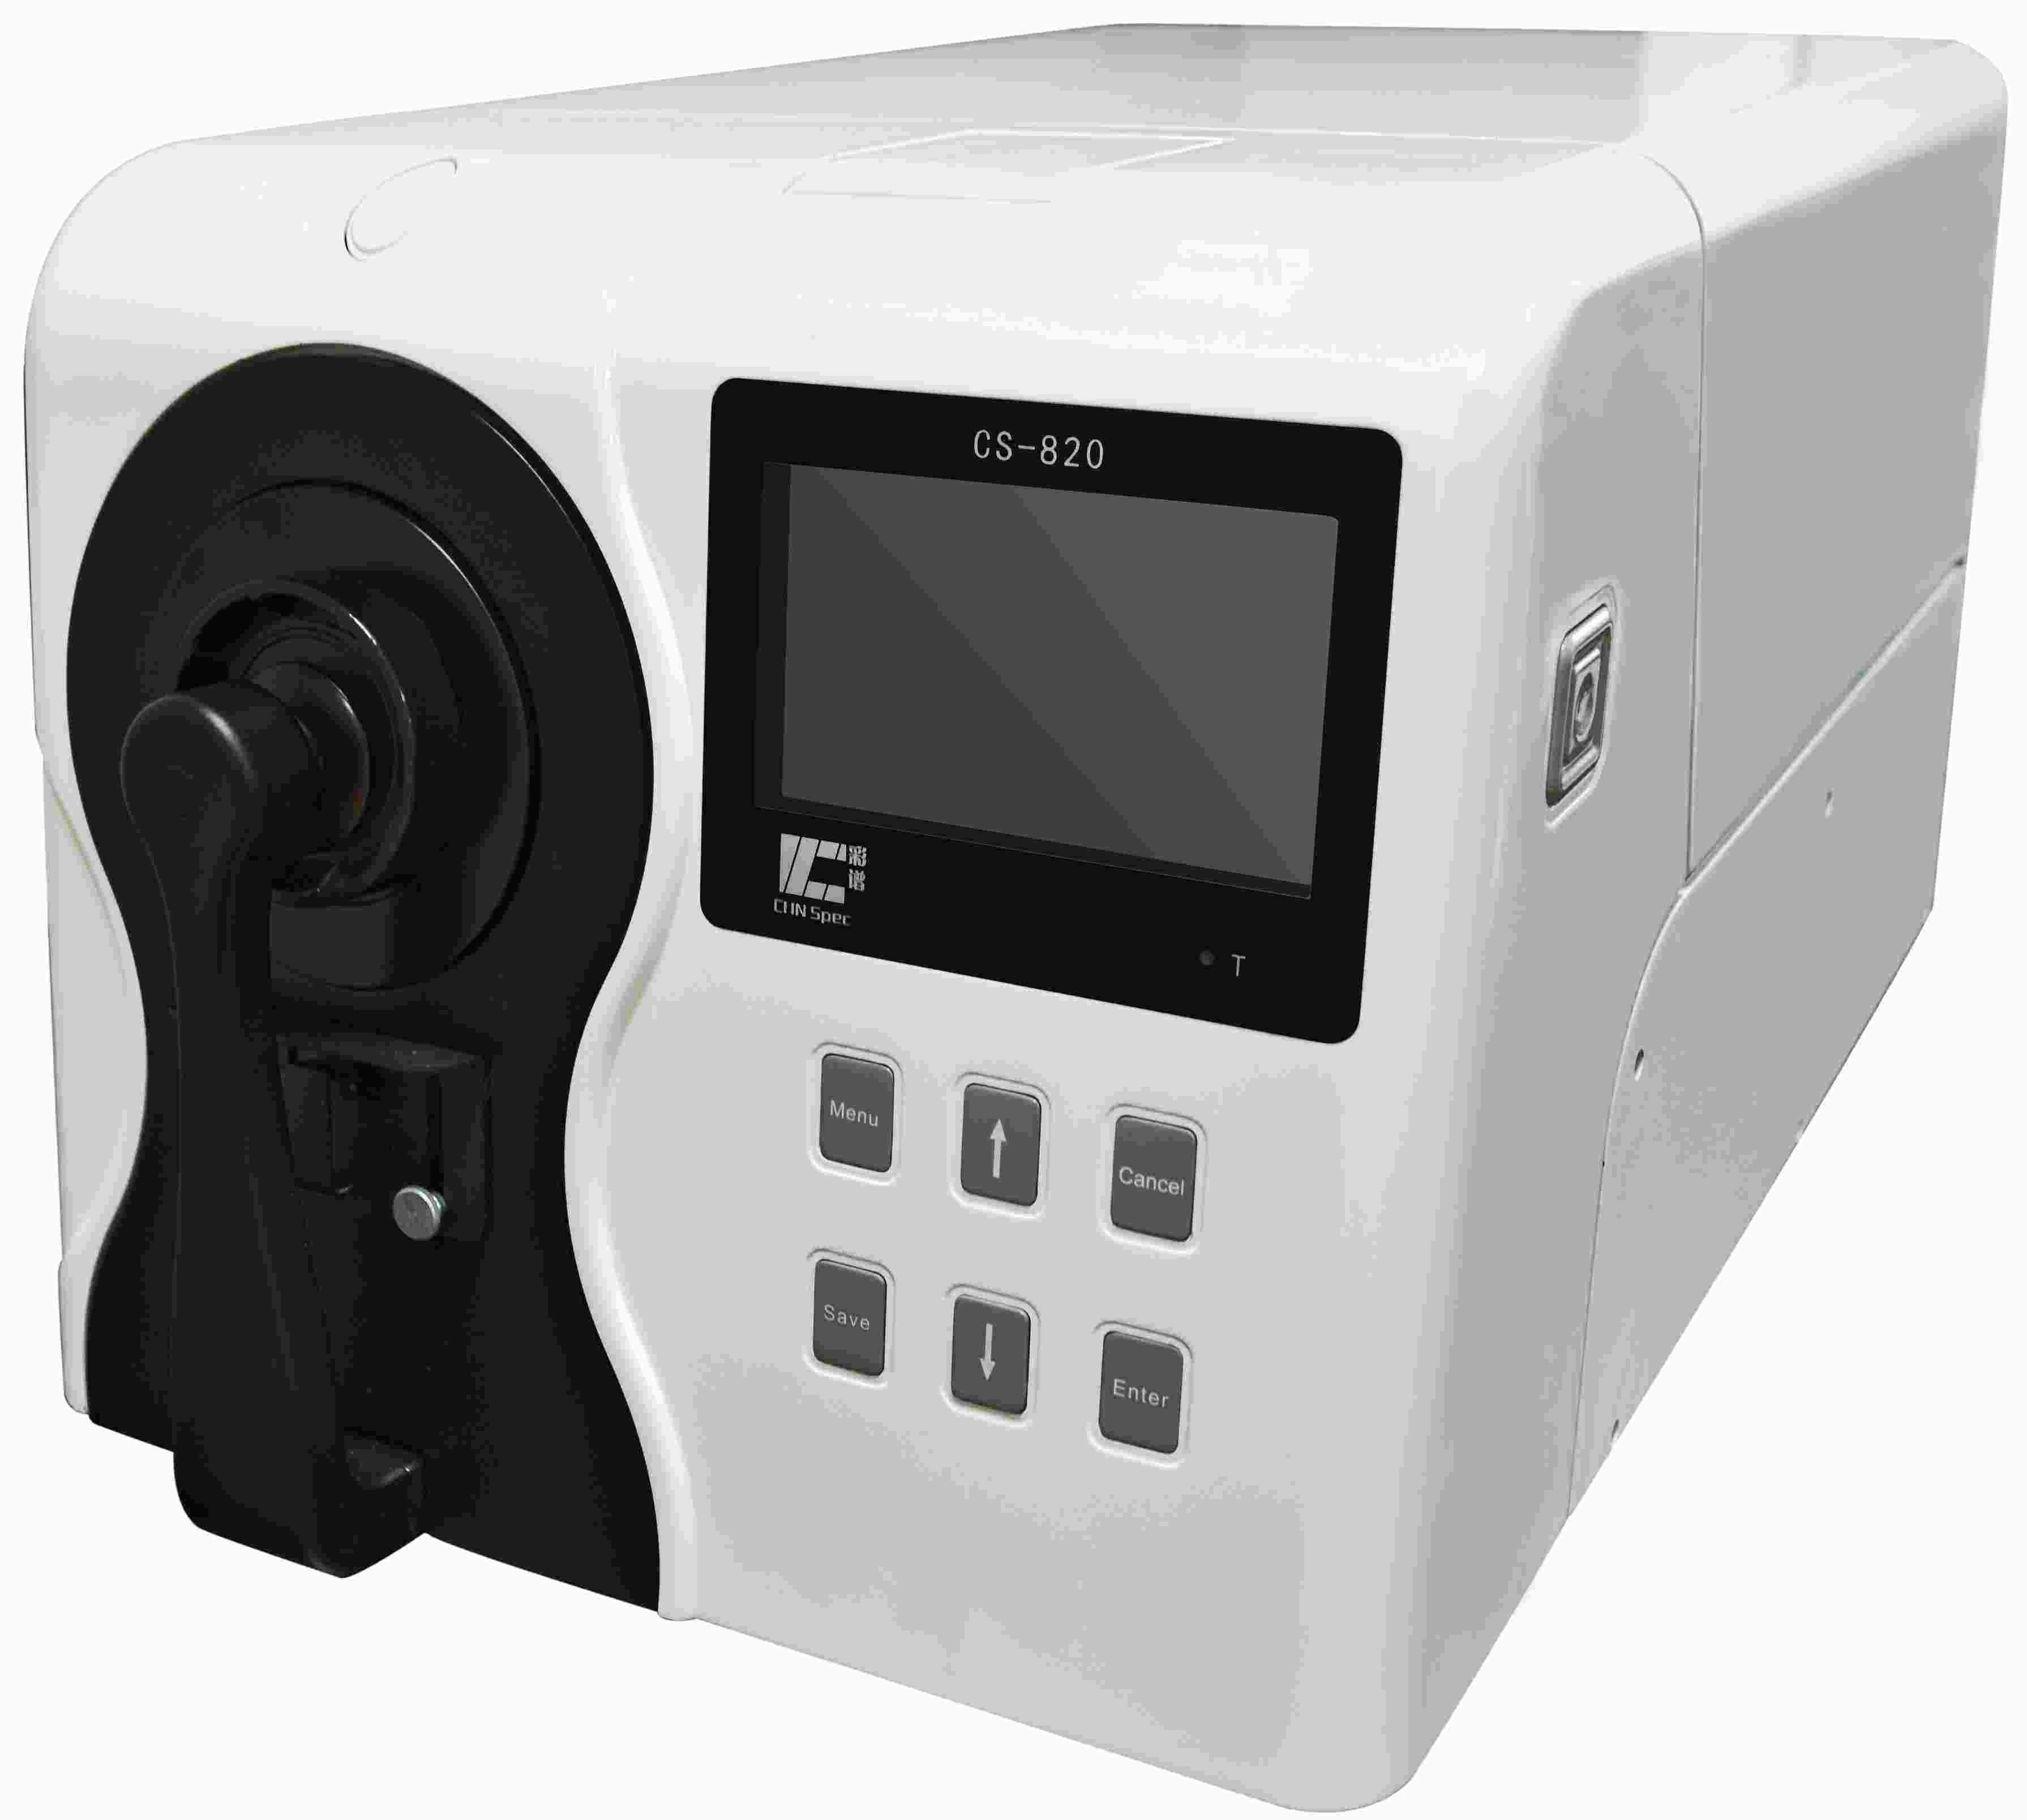 Tabletop Spectrophotometer